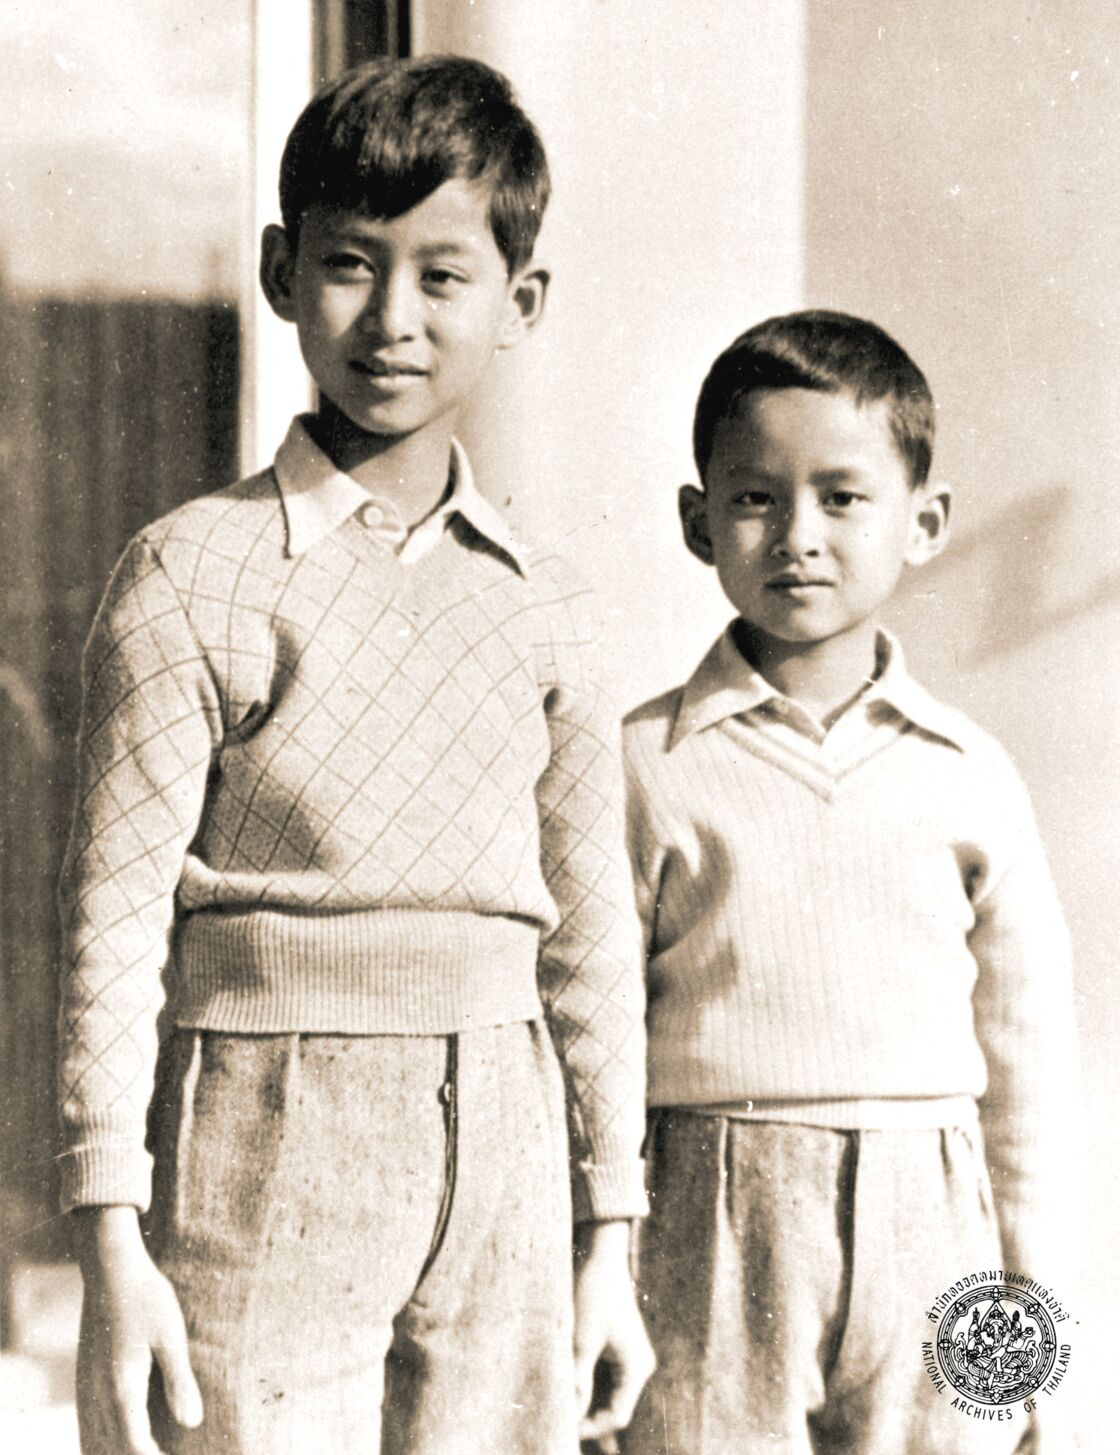 Rama VIII et son frère cadet, Bhumibol Adulyadej (le futur Rama IX), en 1937.